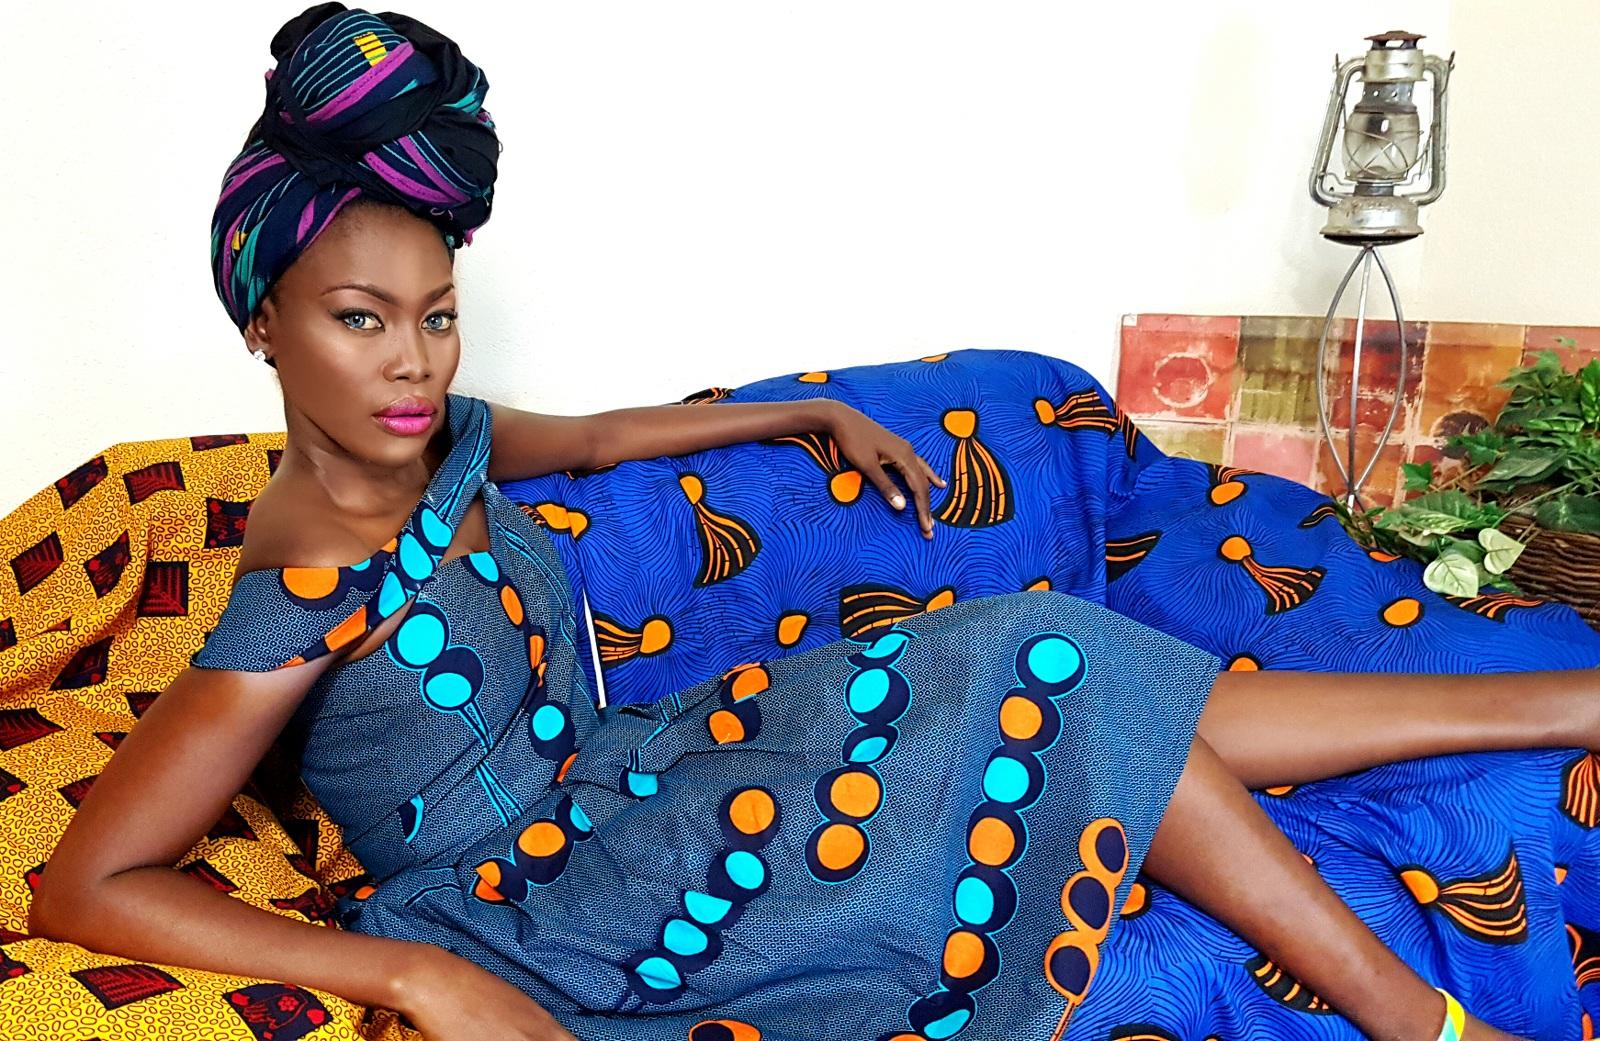 Fashion designer Anrette Ngafor, Founder of Liiber London